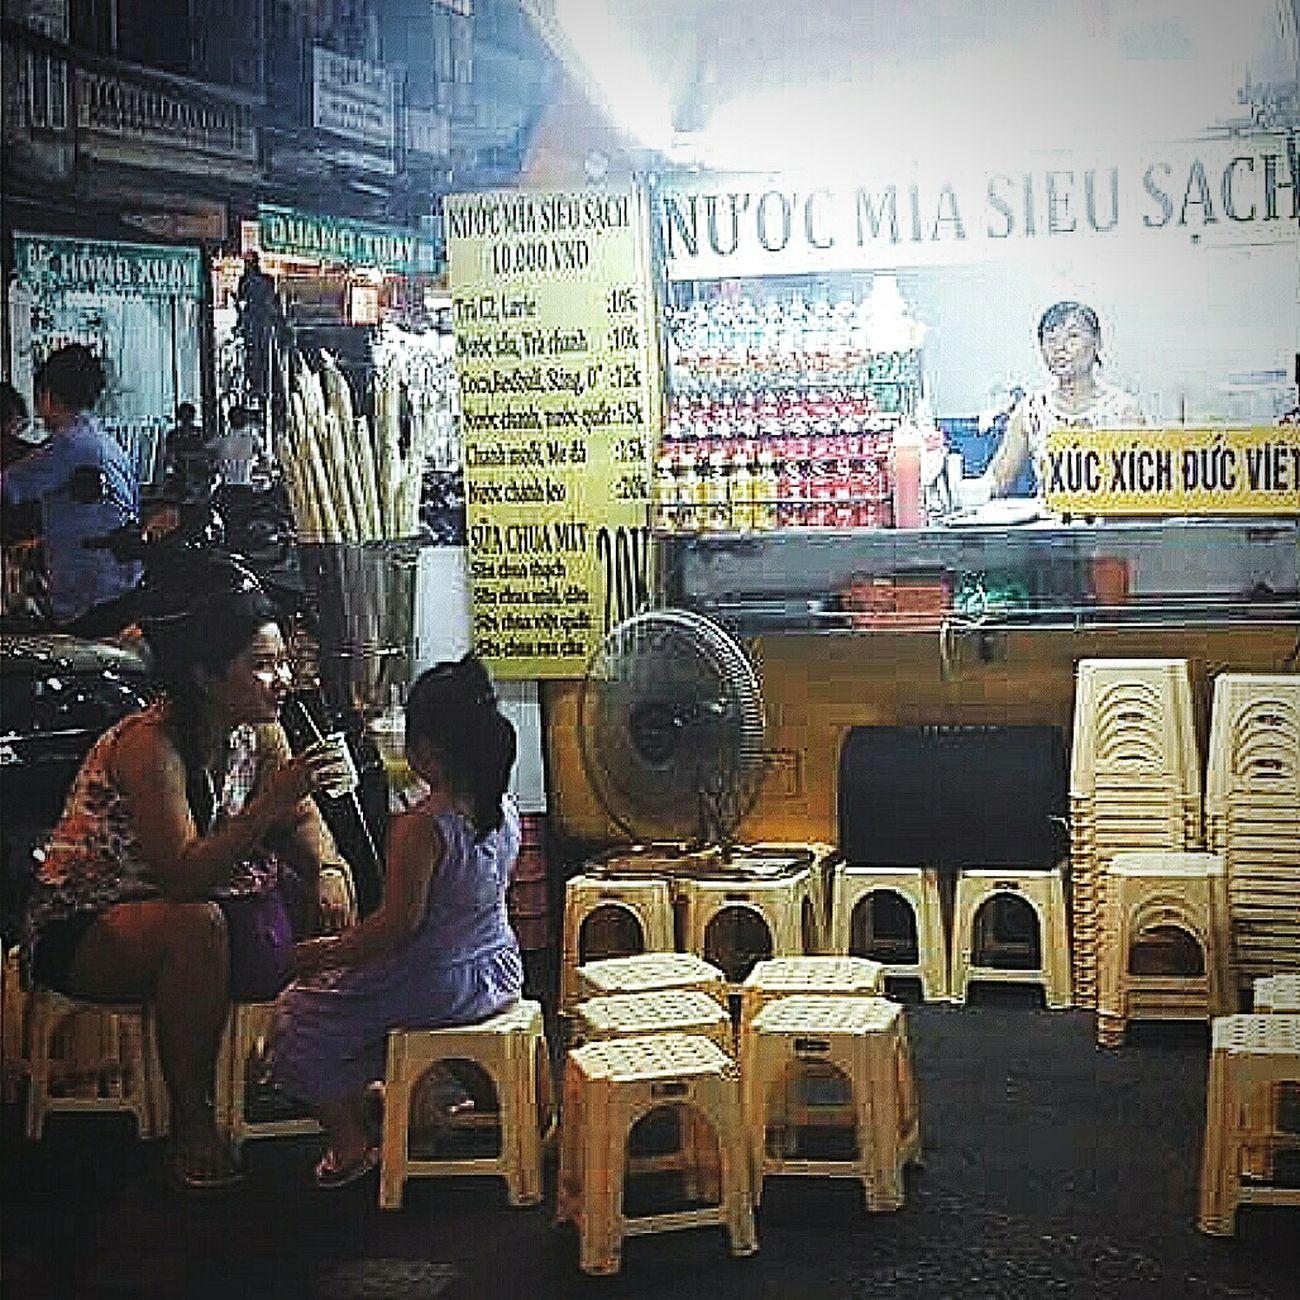 Beverage Stall Sugar Cane Night Hanoi Vietnam Travelphotography Streetphotography